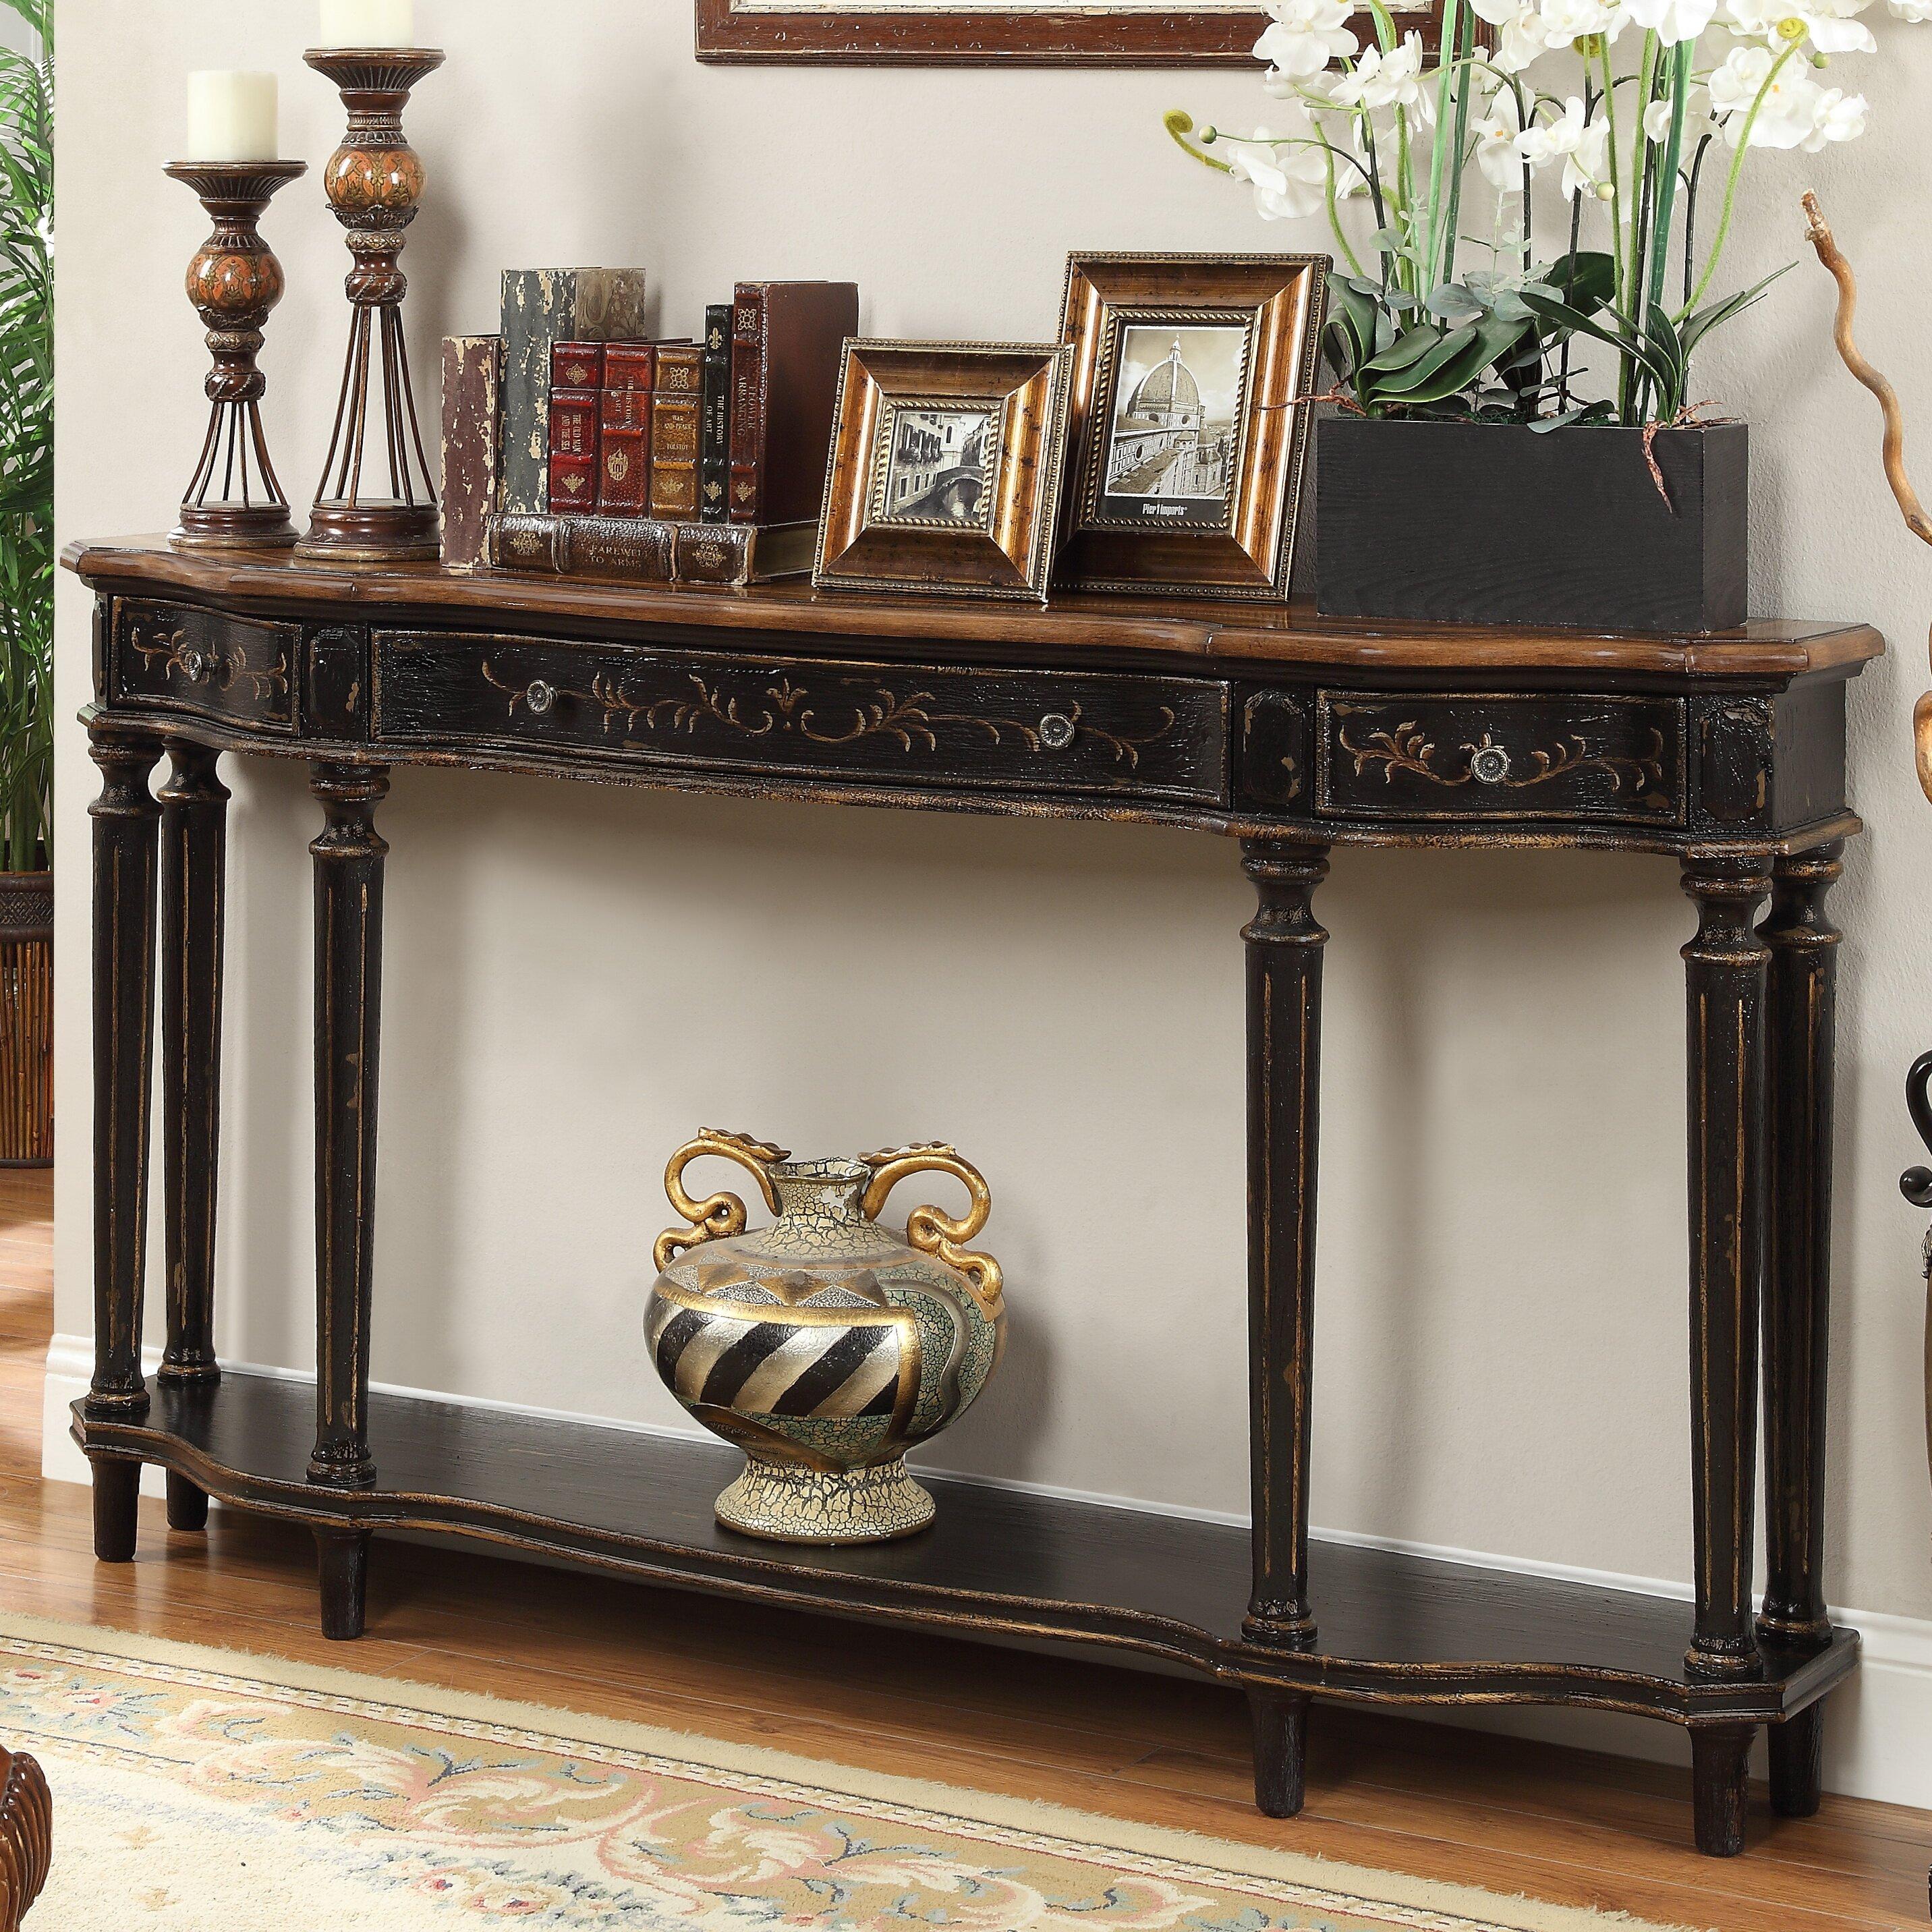 Rosalind Wheeler Pinehill Antique Console Table & Reviews ...